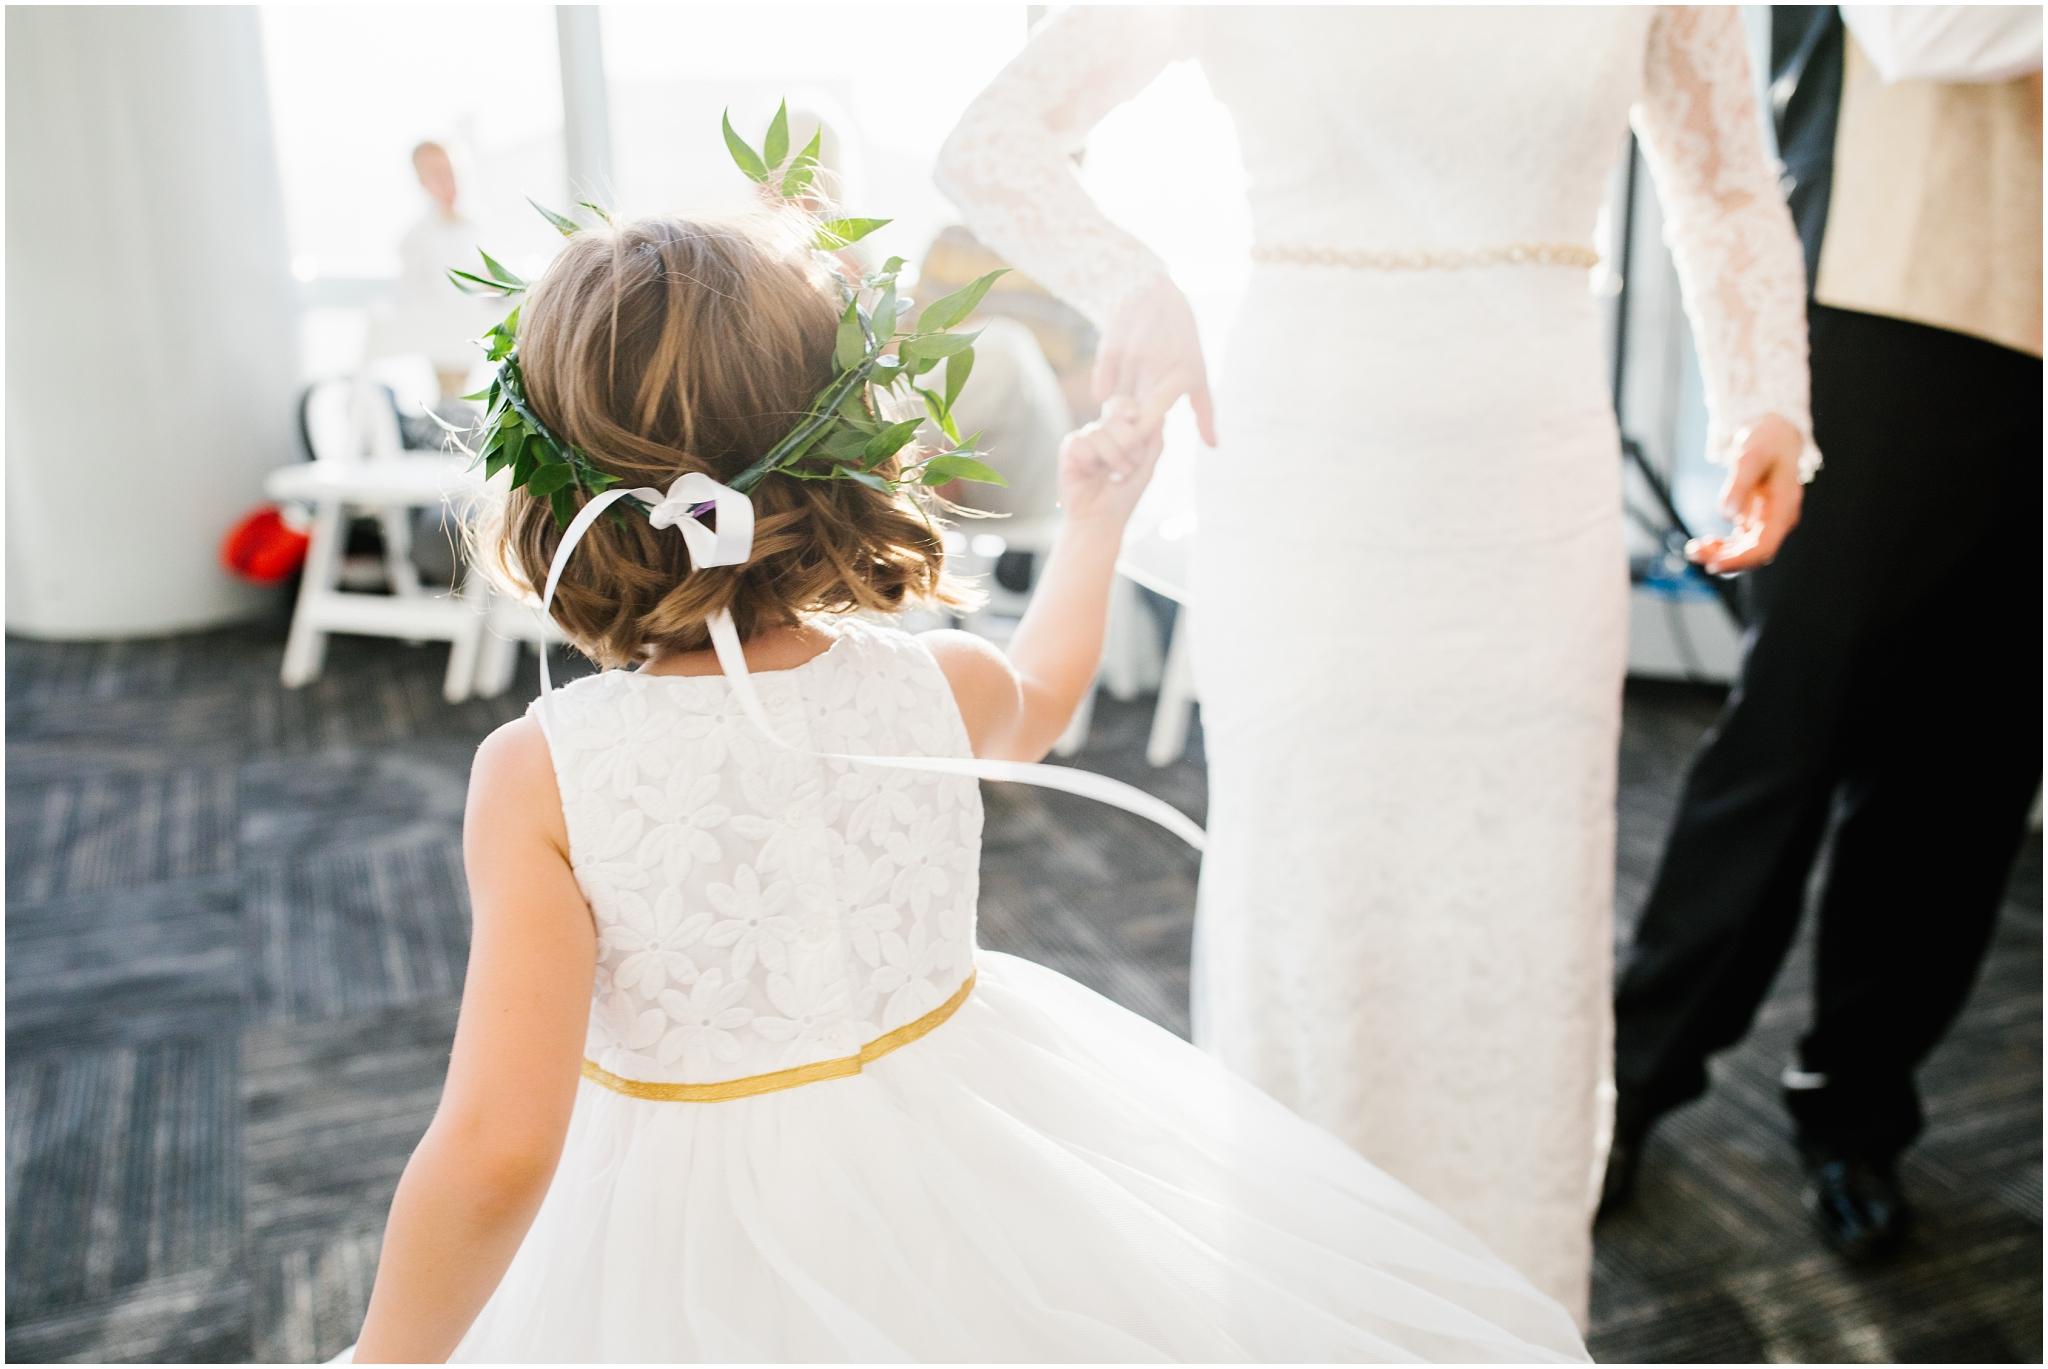 CherylandTyler-575_Lizzie-B-Imagery-Utah-Wedding-Photographer-Salt-Lake-City-Temple-Wells-Fargo-Building-Reception.jpg